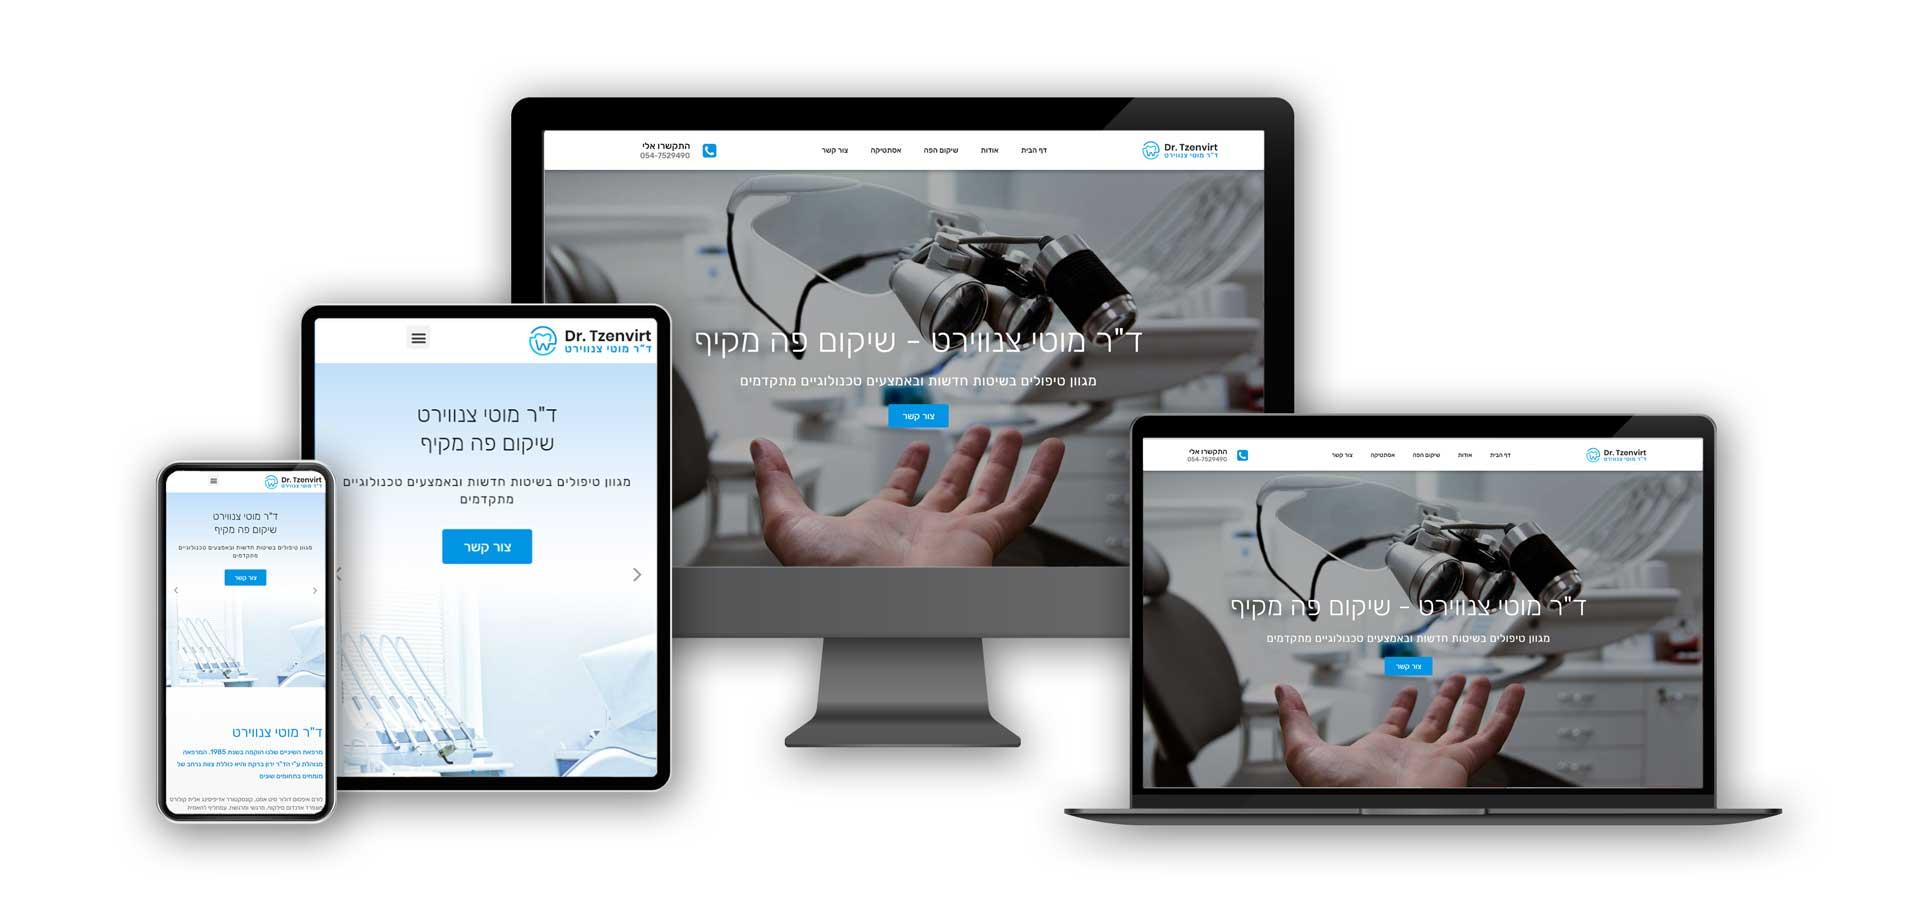 DR. TZENVIRT website on different screens